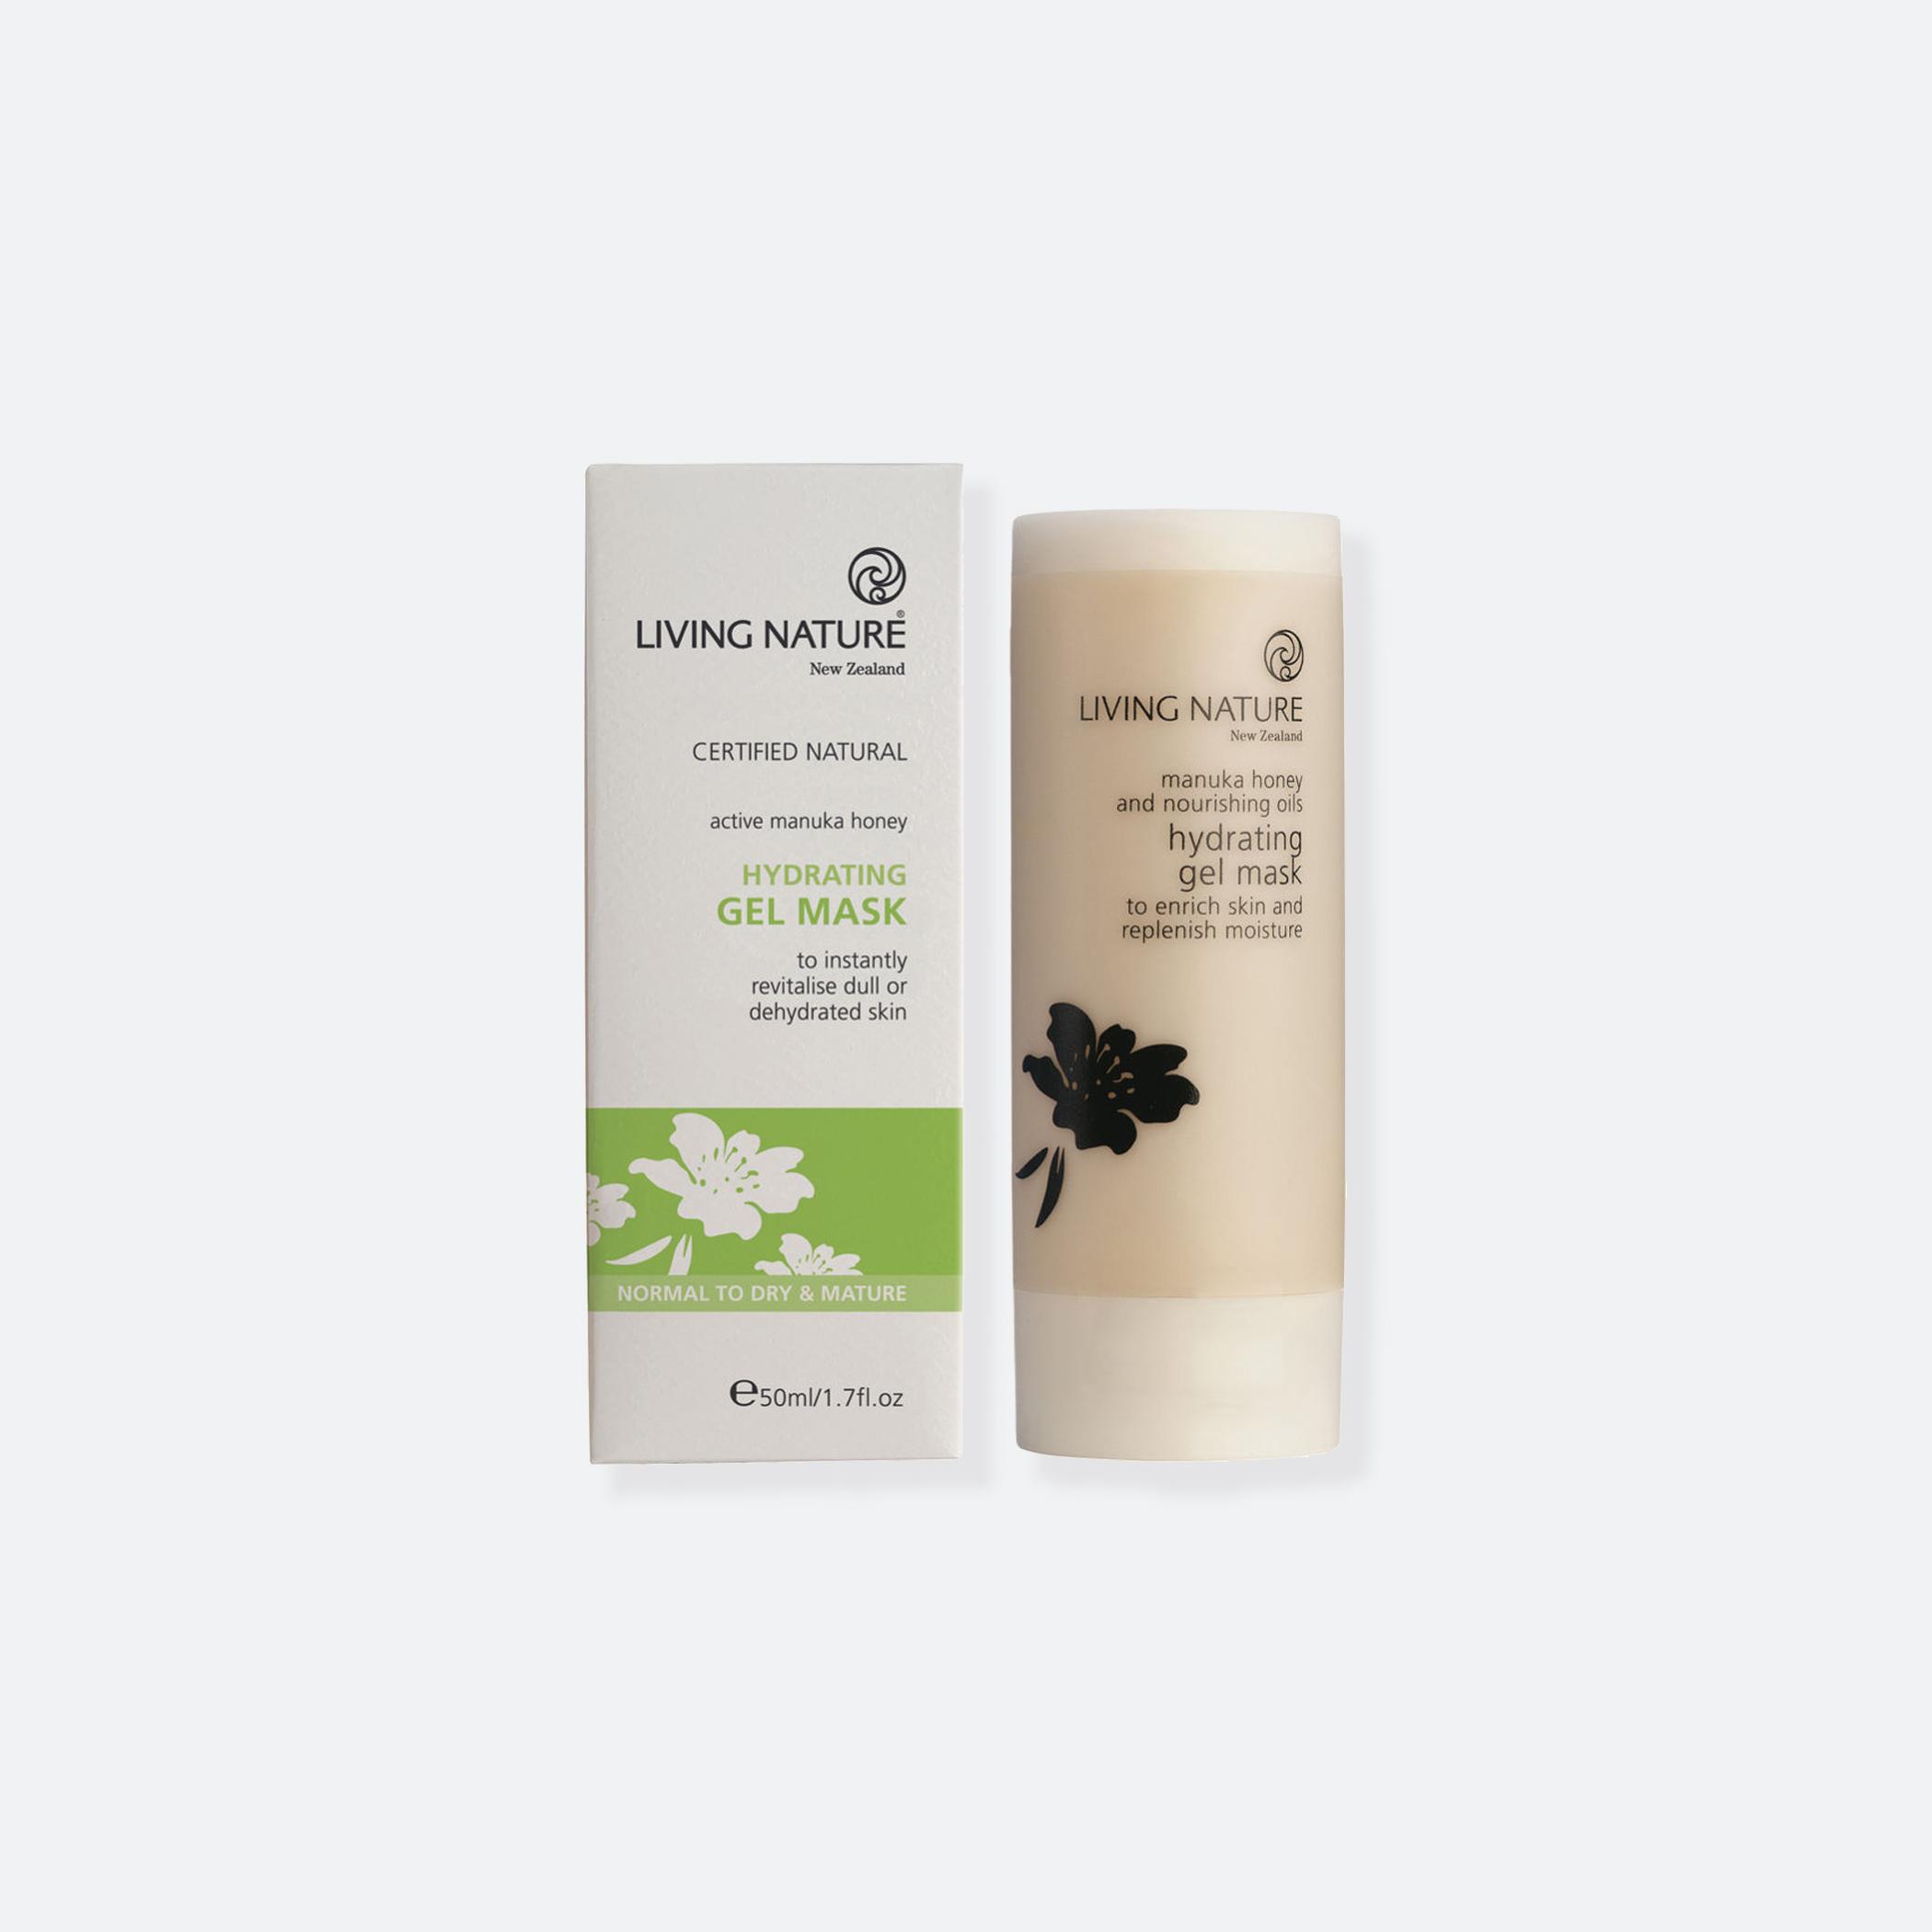 OhMart Living Nature Hydrating Gel Mask 1